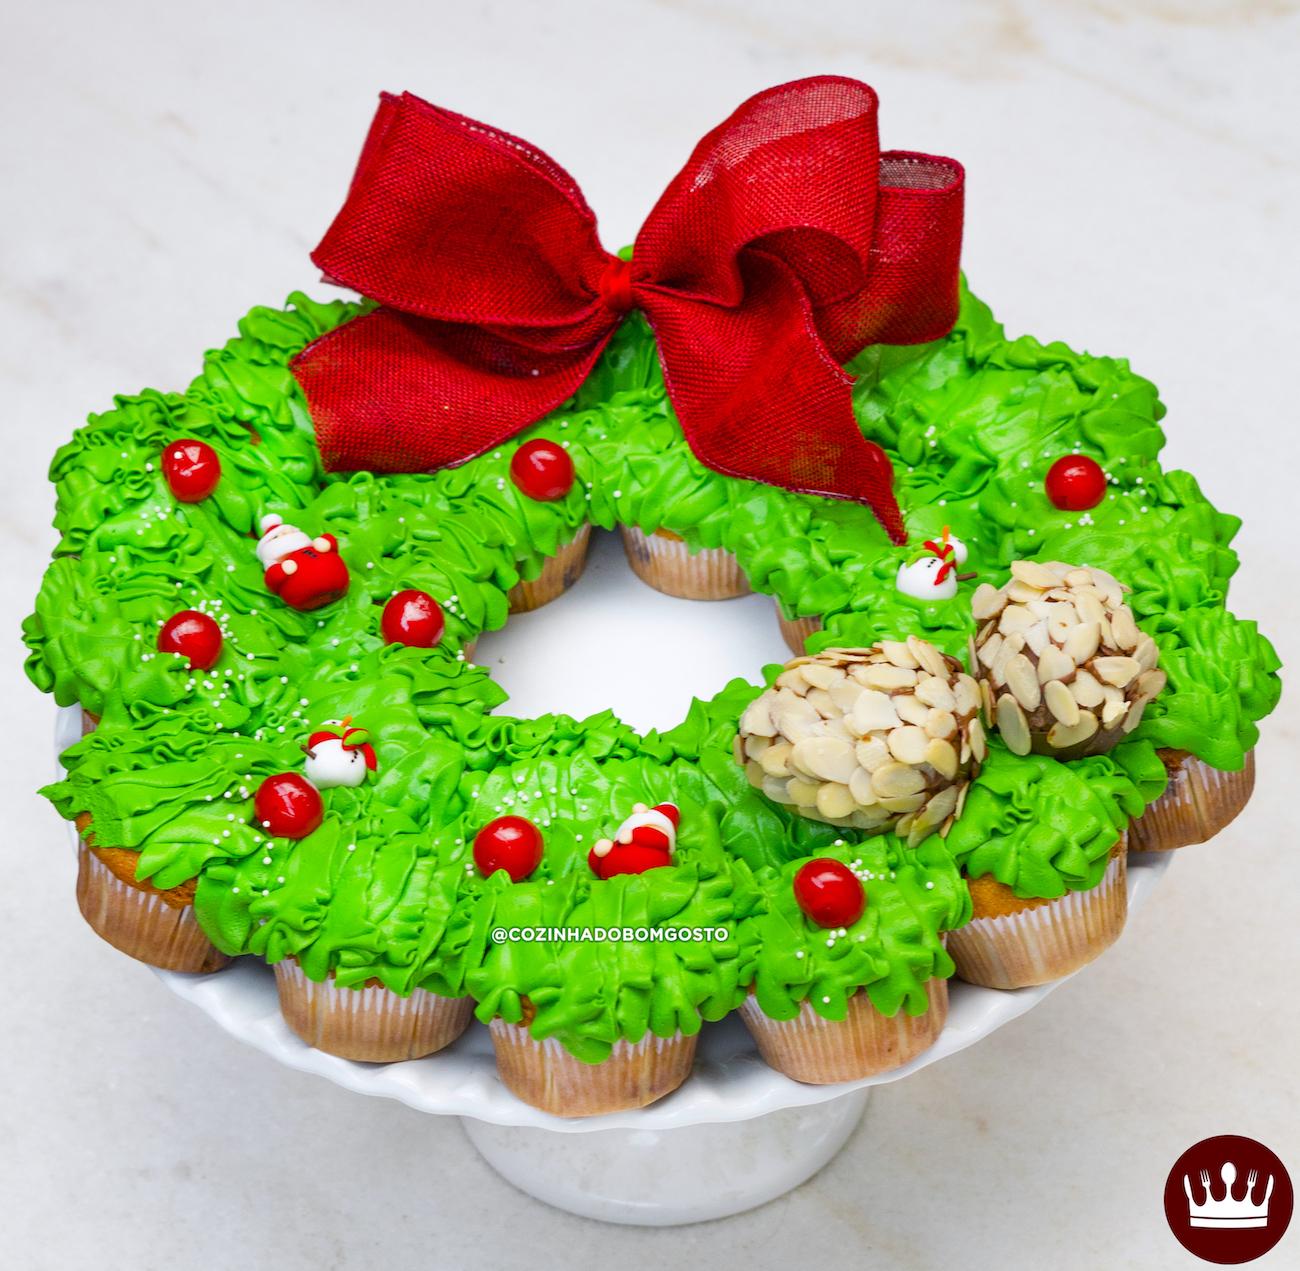 GUIRLANDA DE CUPCAKE (fácil de fazer!) – Especial de Natal!